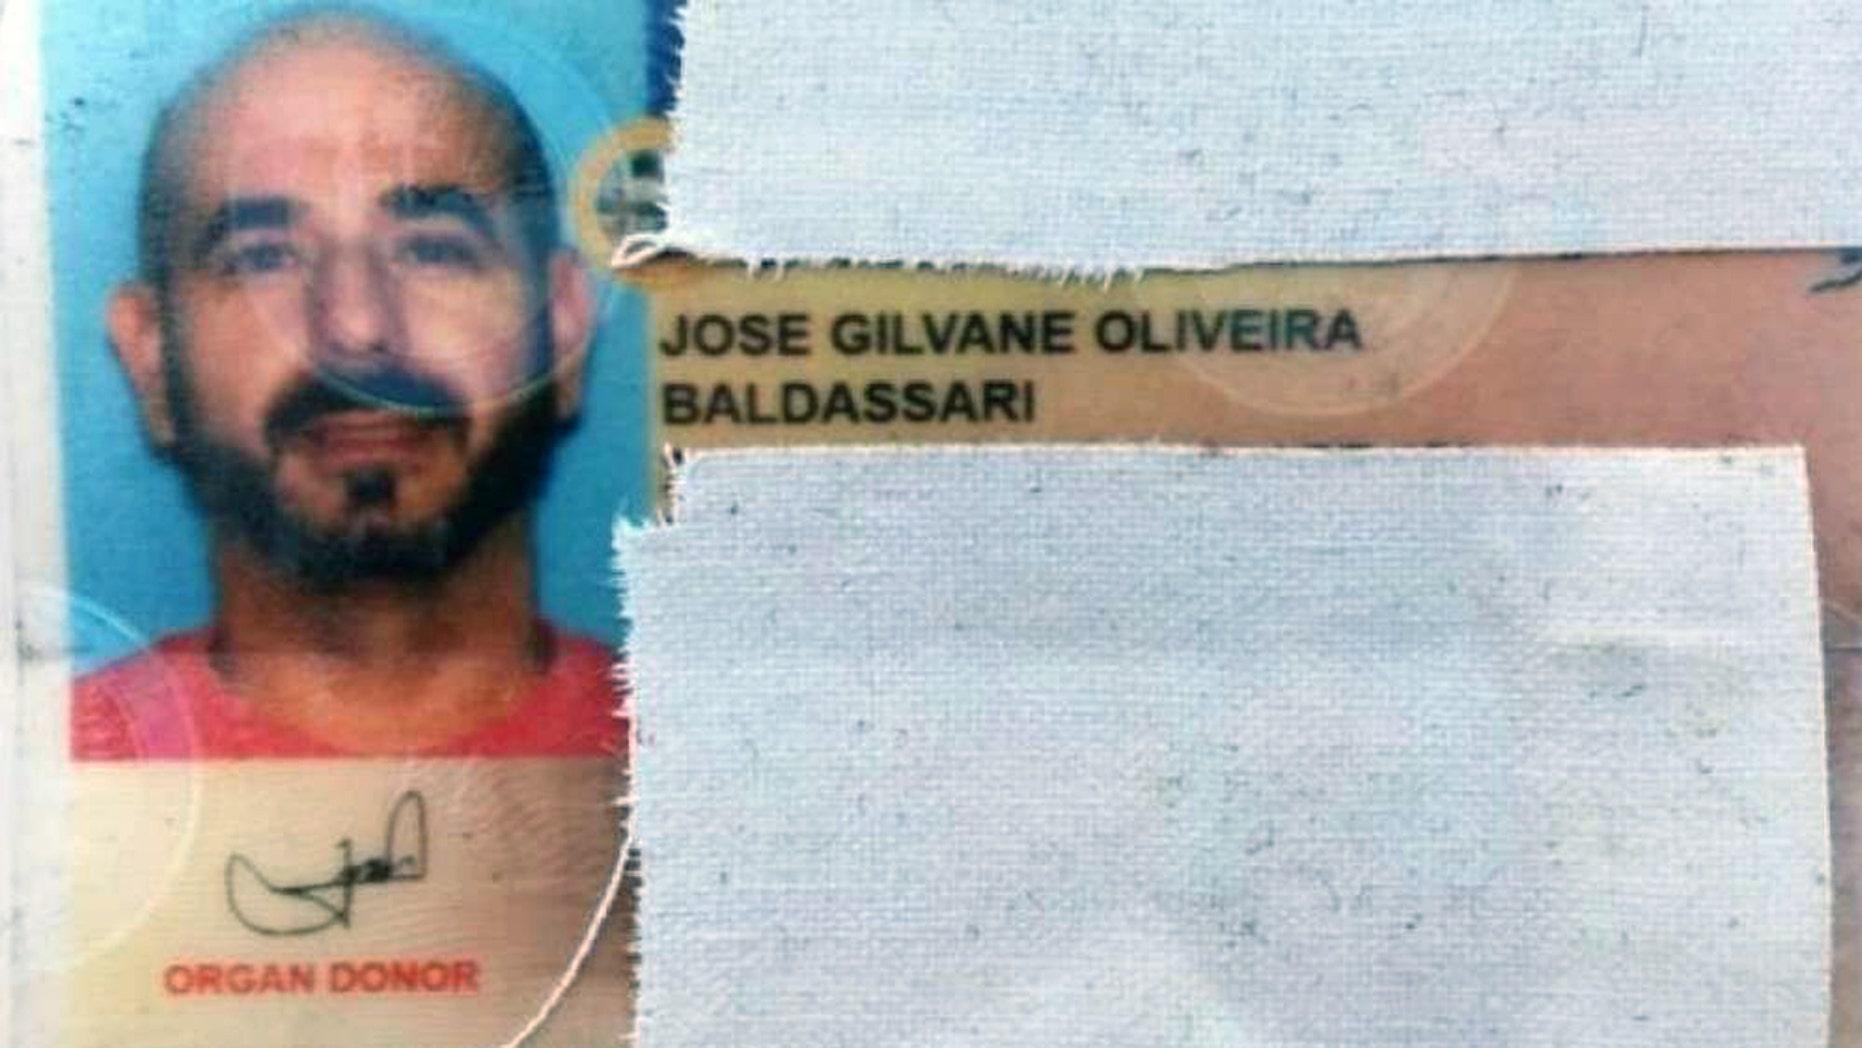 Jose Baldassari was arrested six miles from the Marcelino Serna border crossing in El Paso County, Texas.